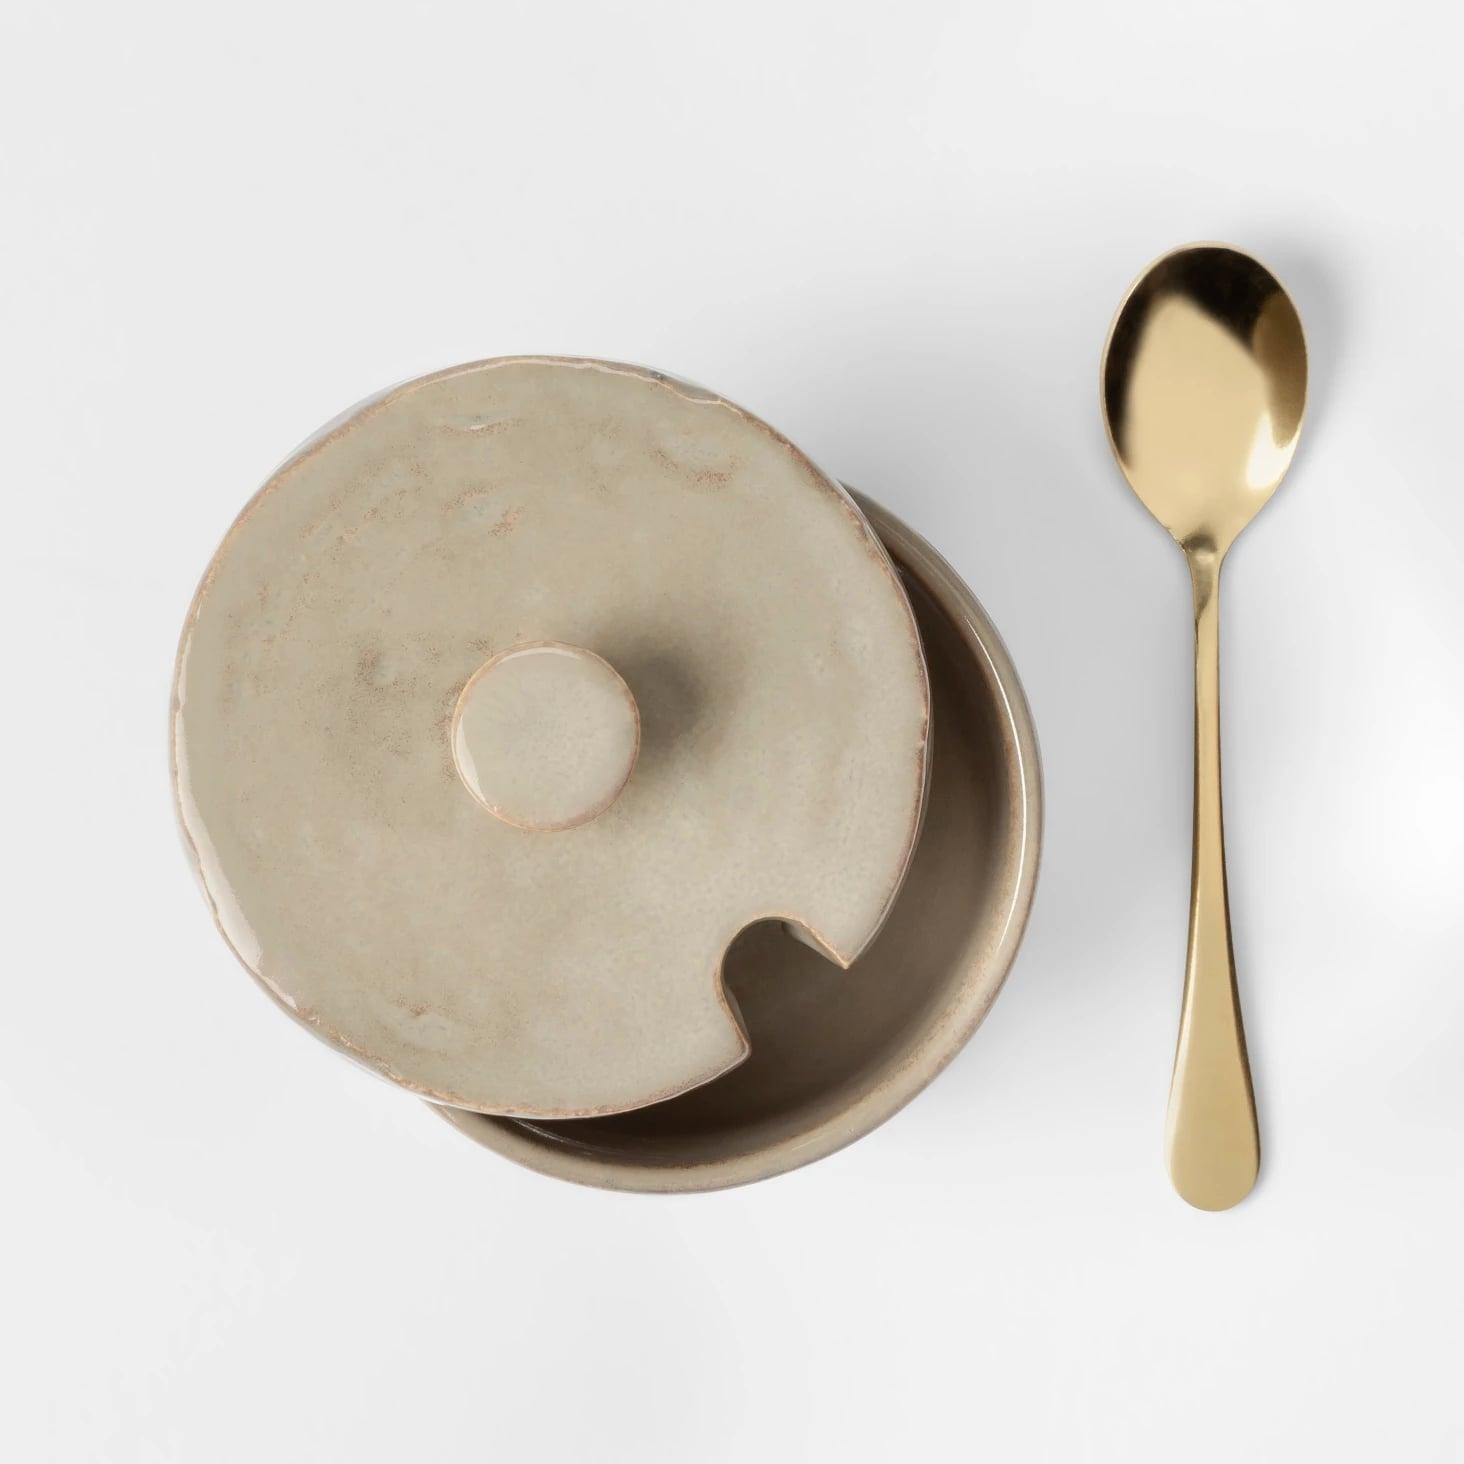 Cravings By Chrissy Teigen Tan Gray Stoneware Sugar Bowl-No Spoon